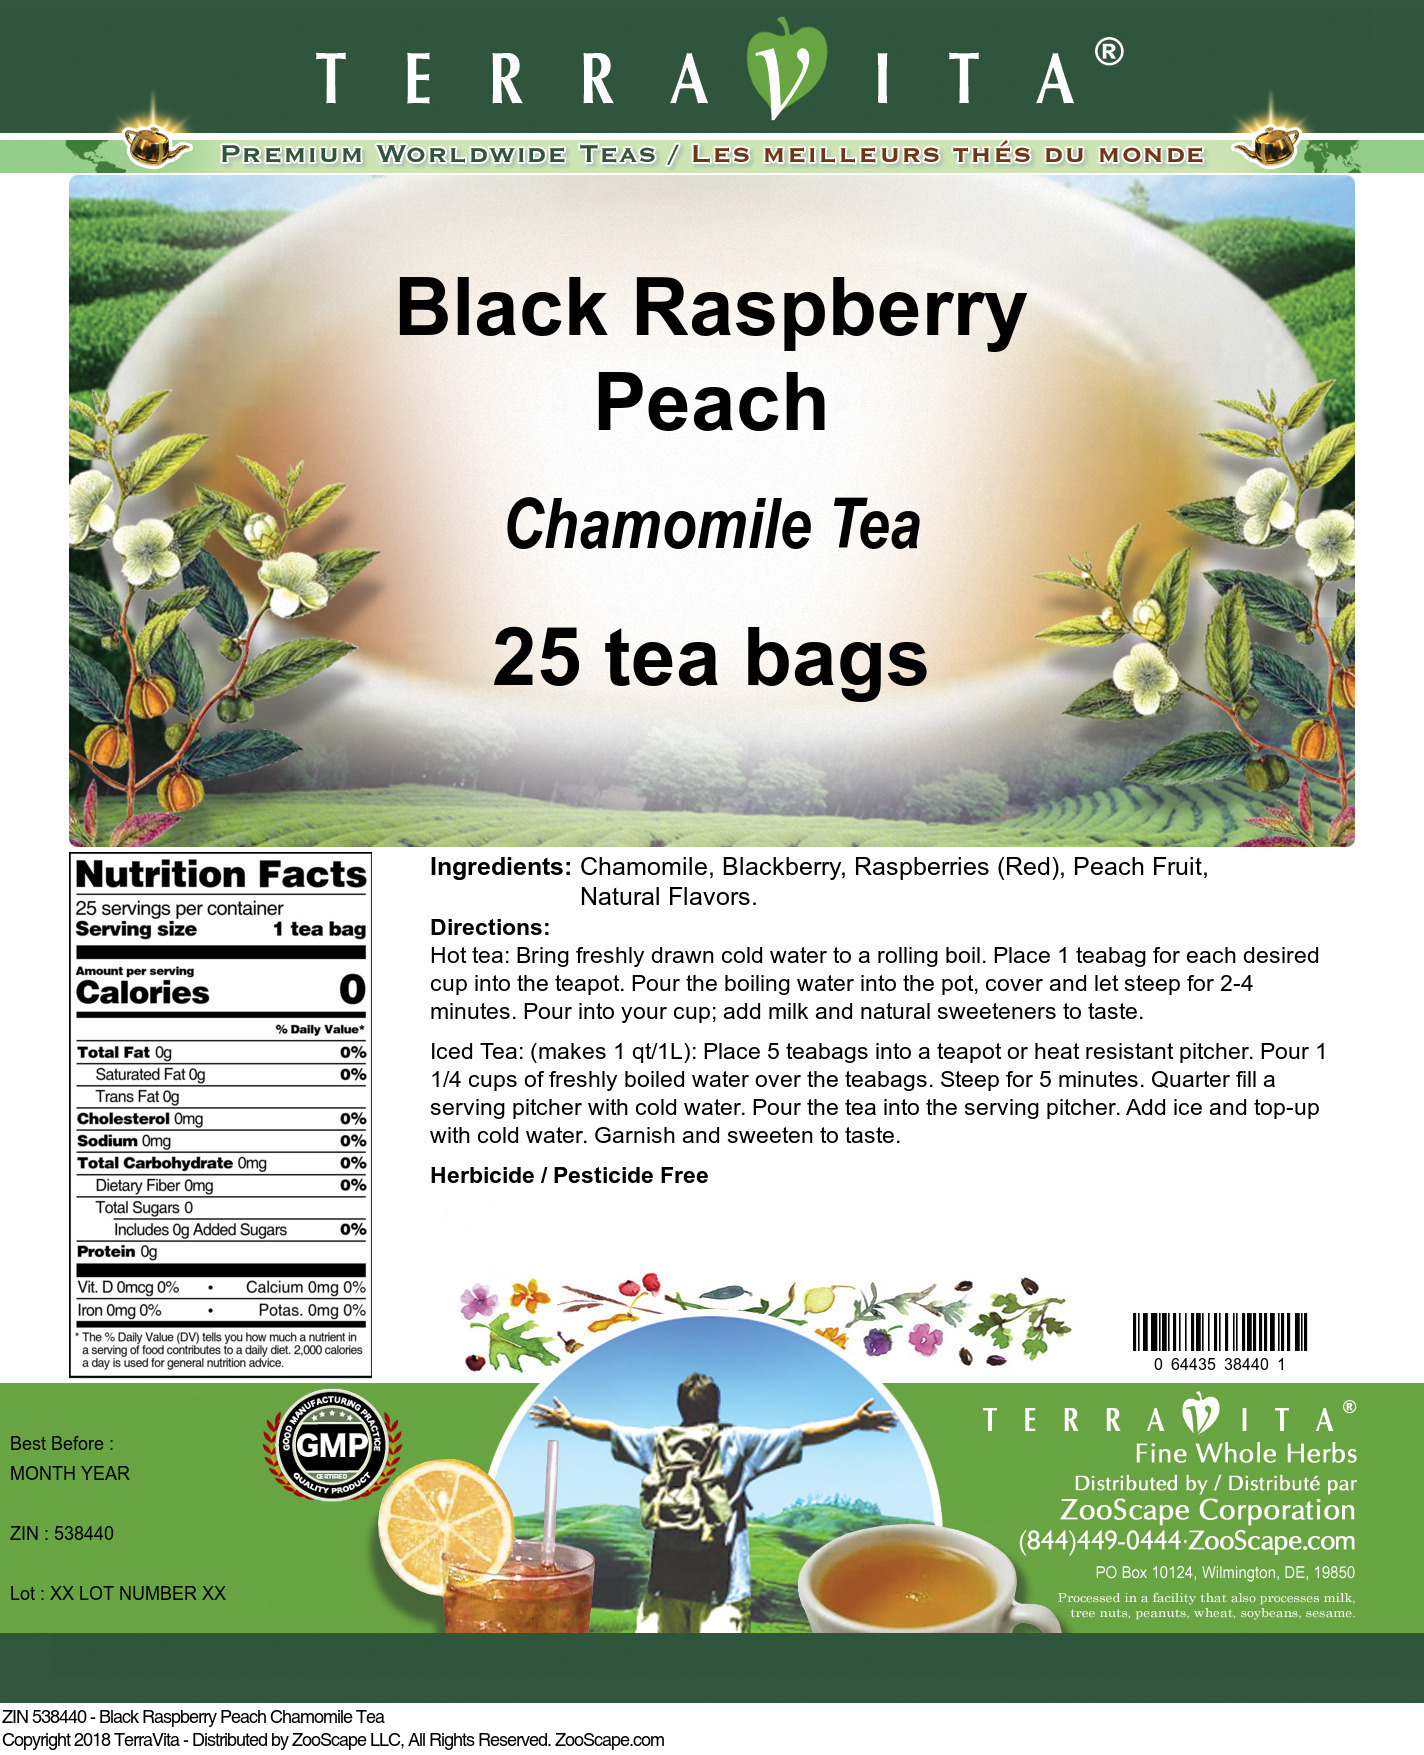 Black Raspberry Peach Chamomile Tea